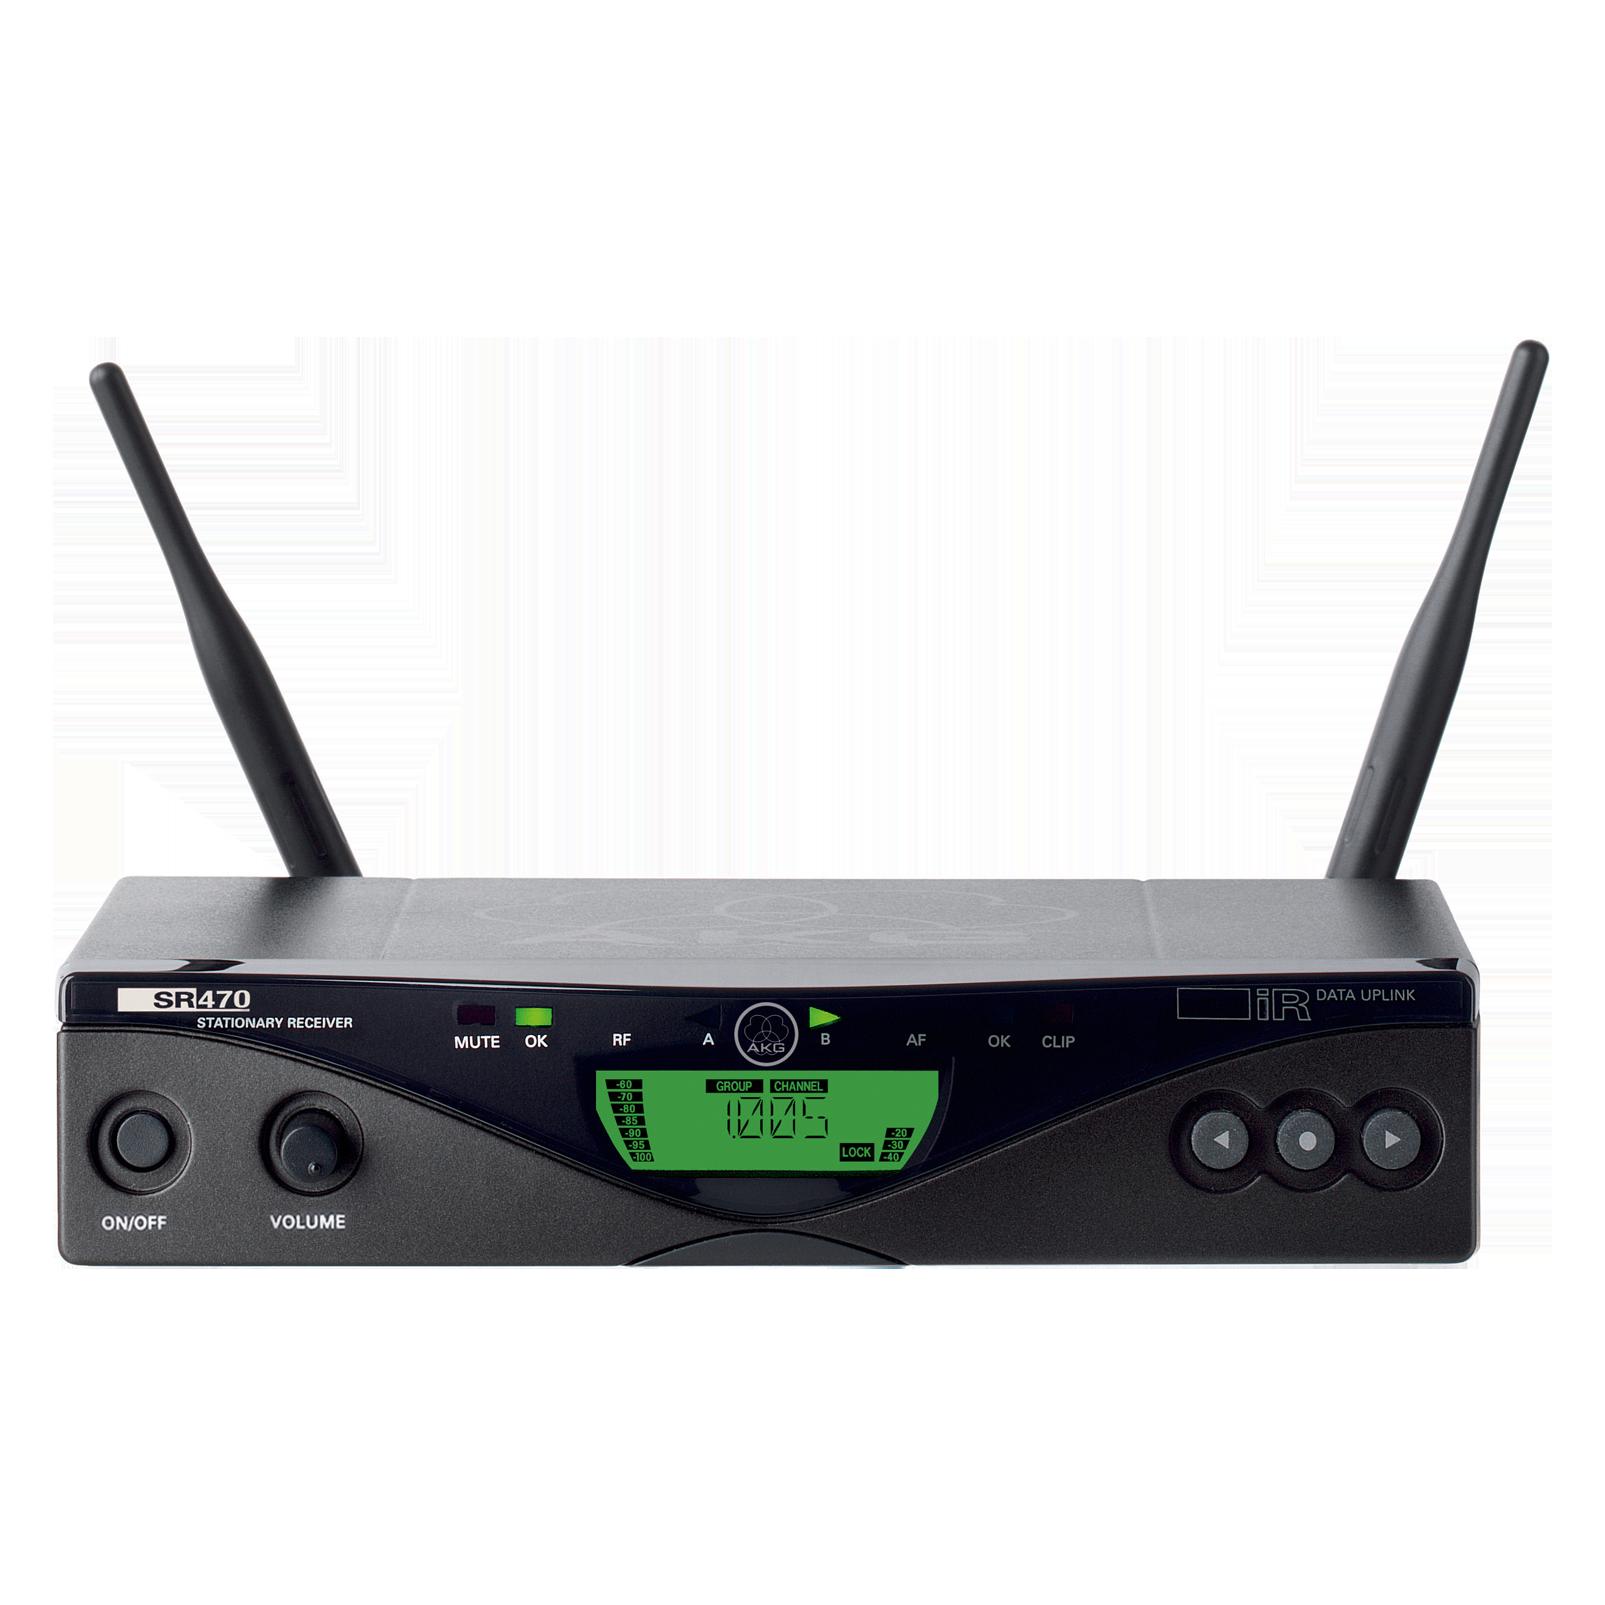 SR470 Band-7 (B-Stock) - Black - Professional wireless stationary receiver - Hero